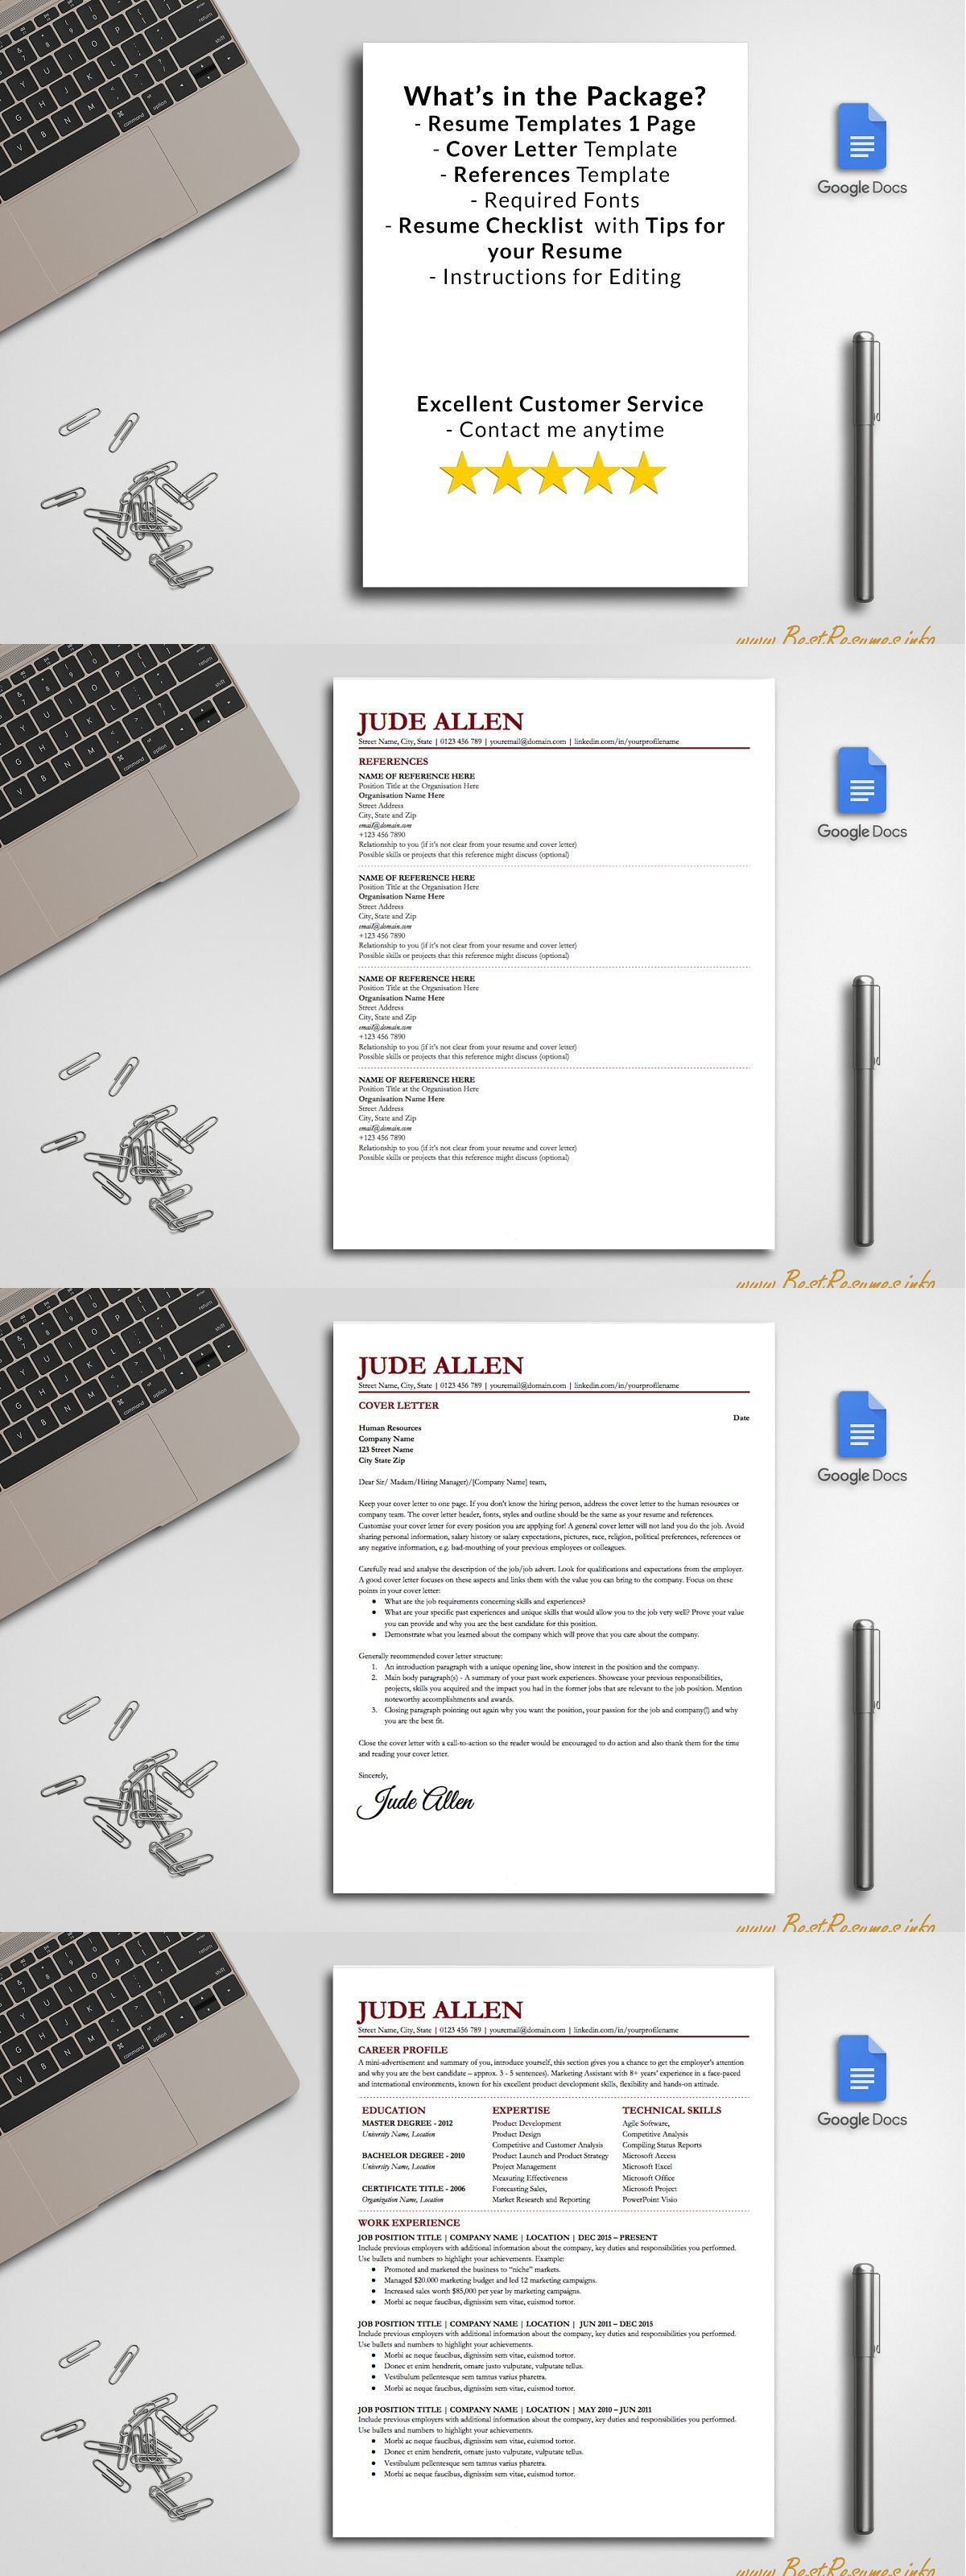 Resume Template Google Docs Resume template, Simple